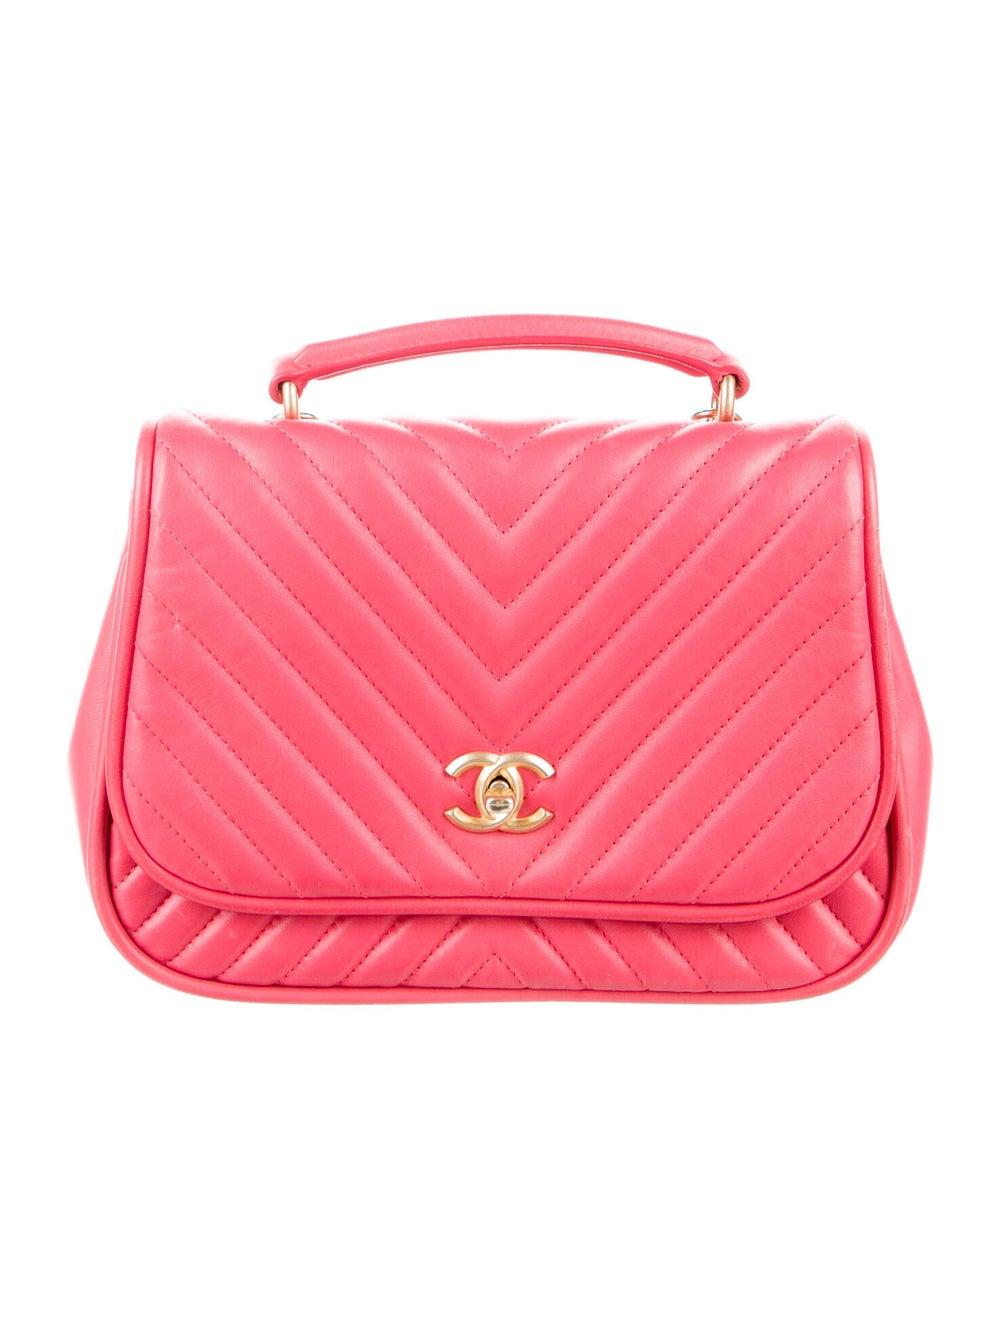 Chanel Reversed Chevron Bag Pink - image 1